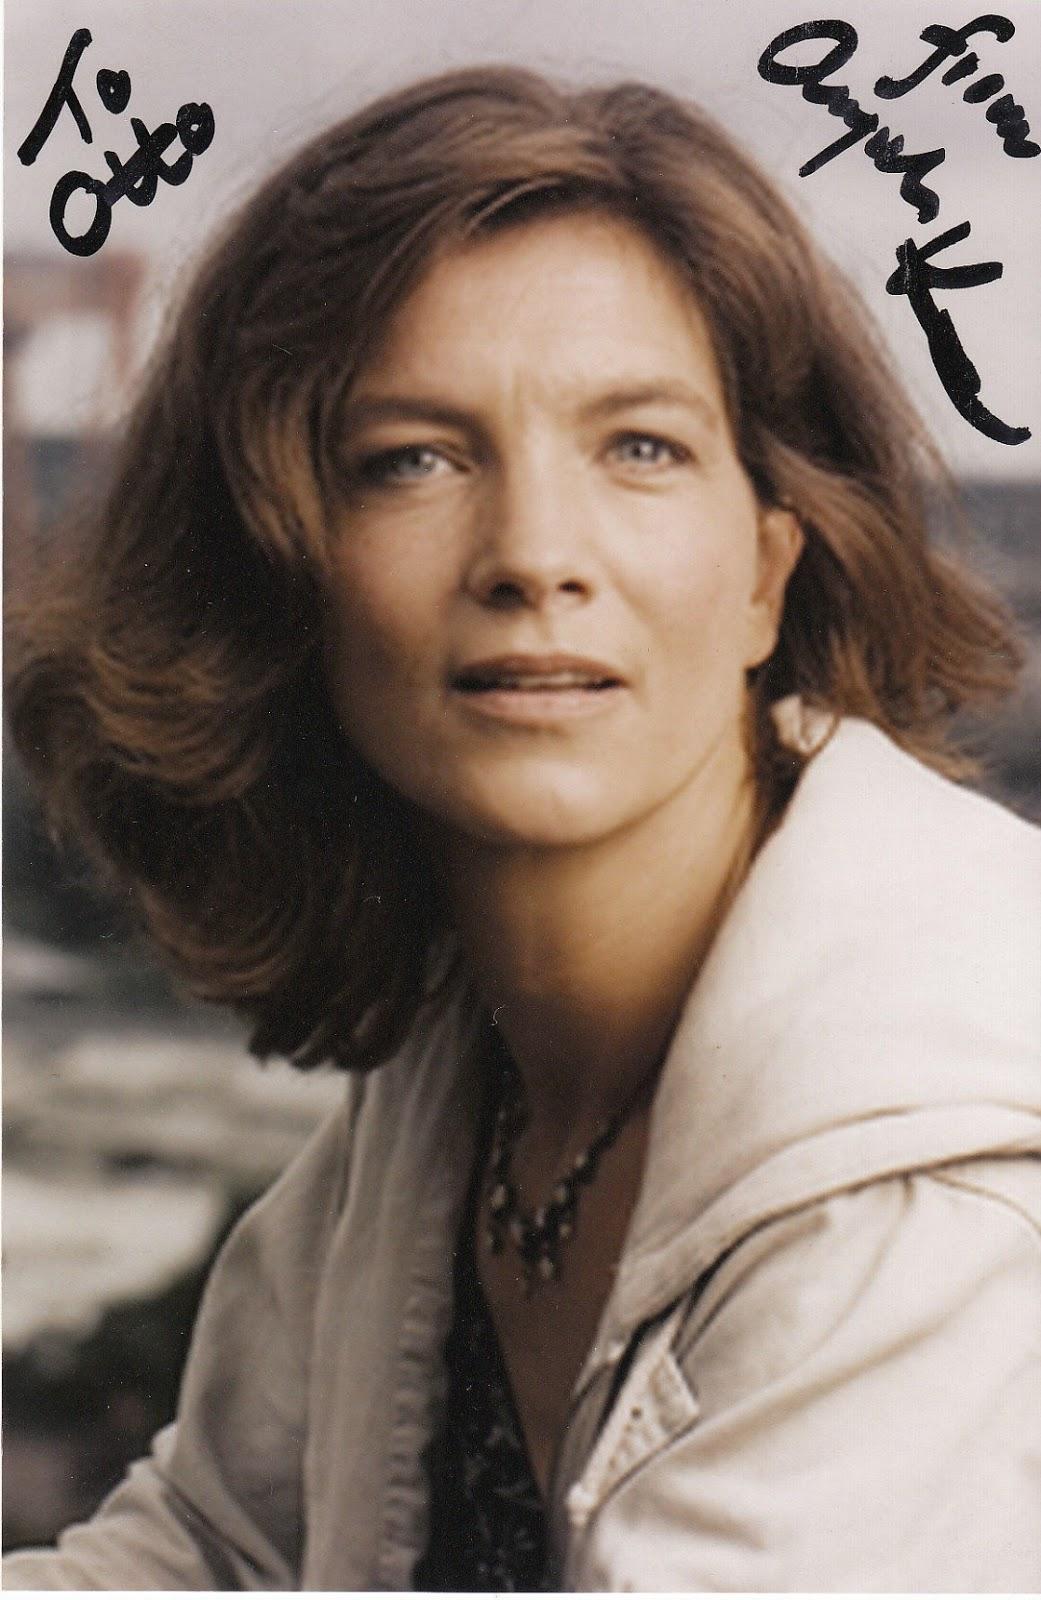 Angela Kovacs